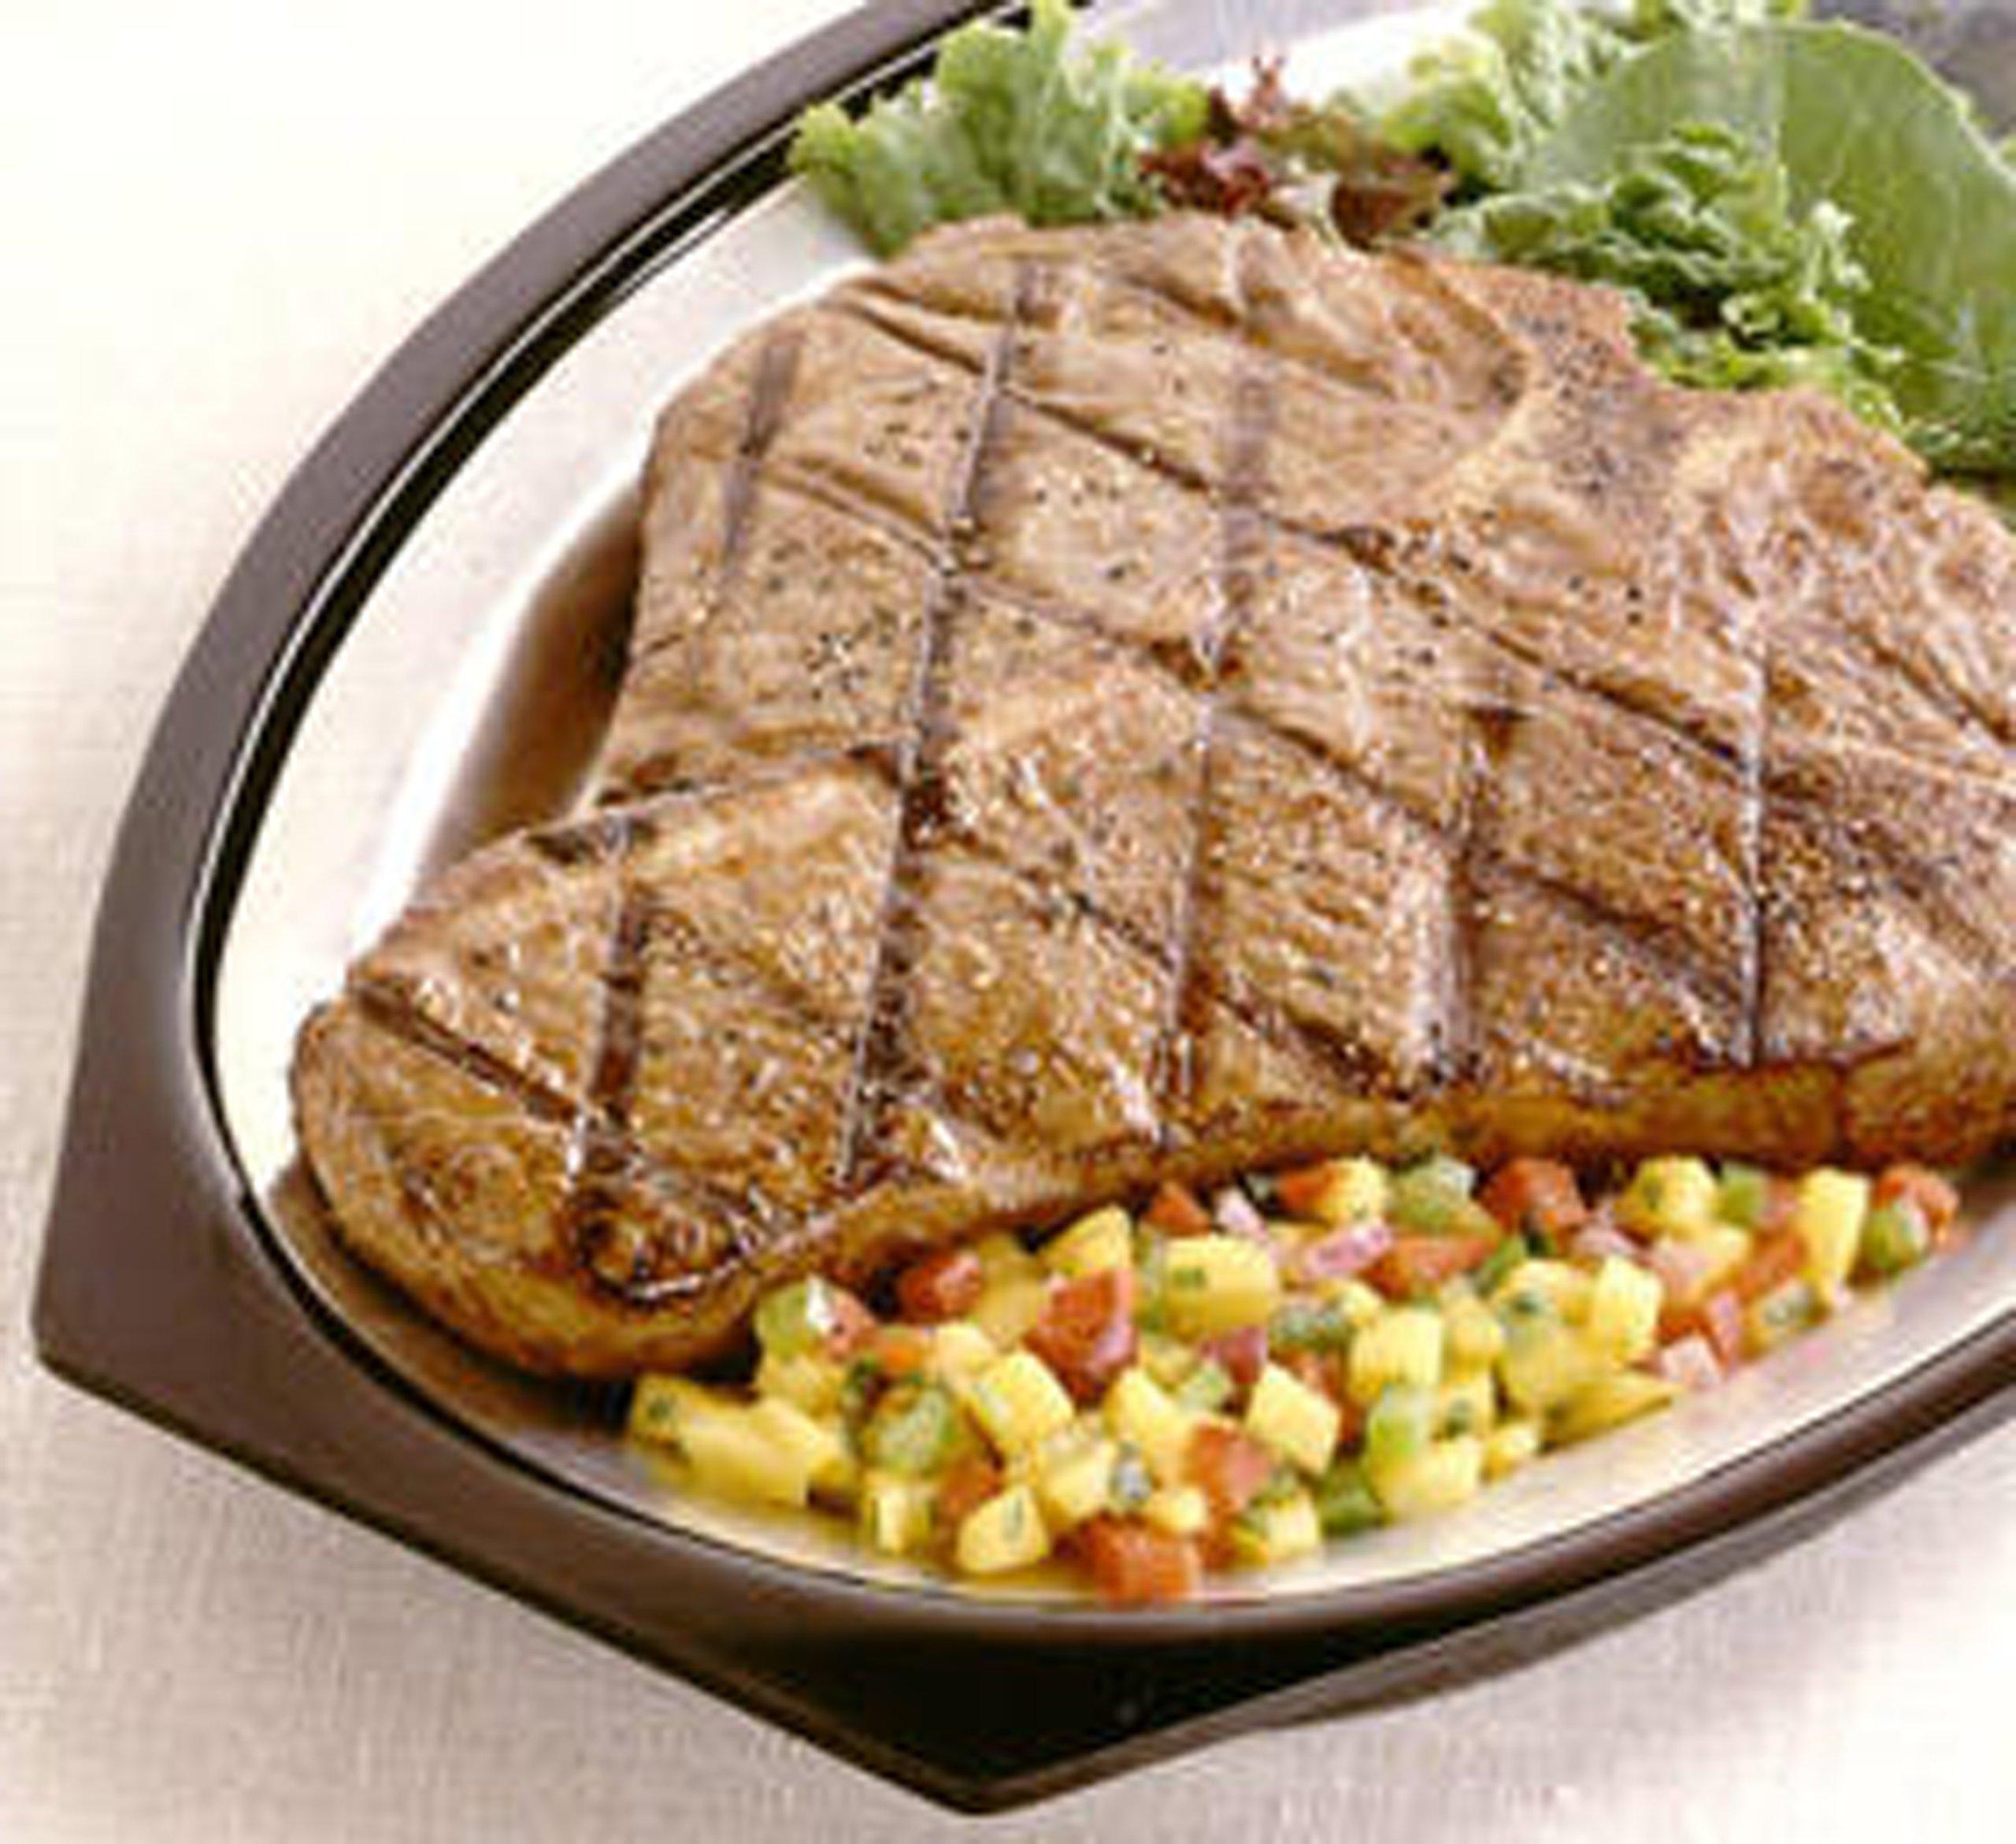 Nordic Ware Steak 'n Fajita Platter Server by Nordic Ware (Image #2)